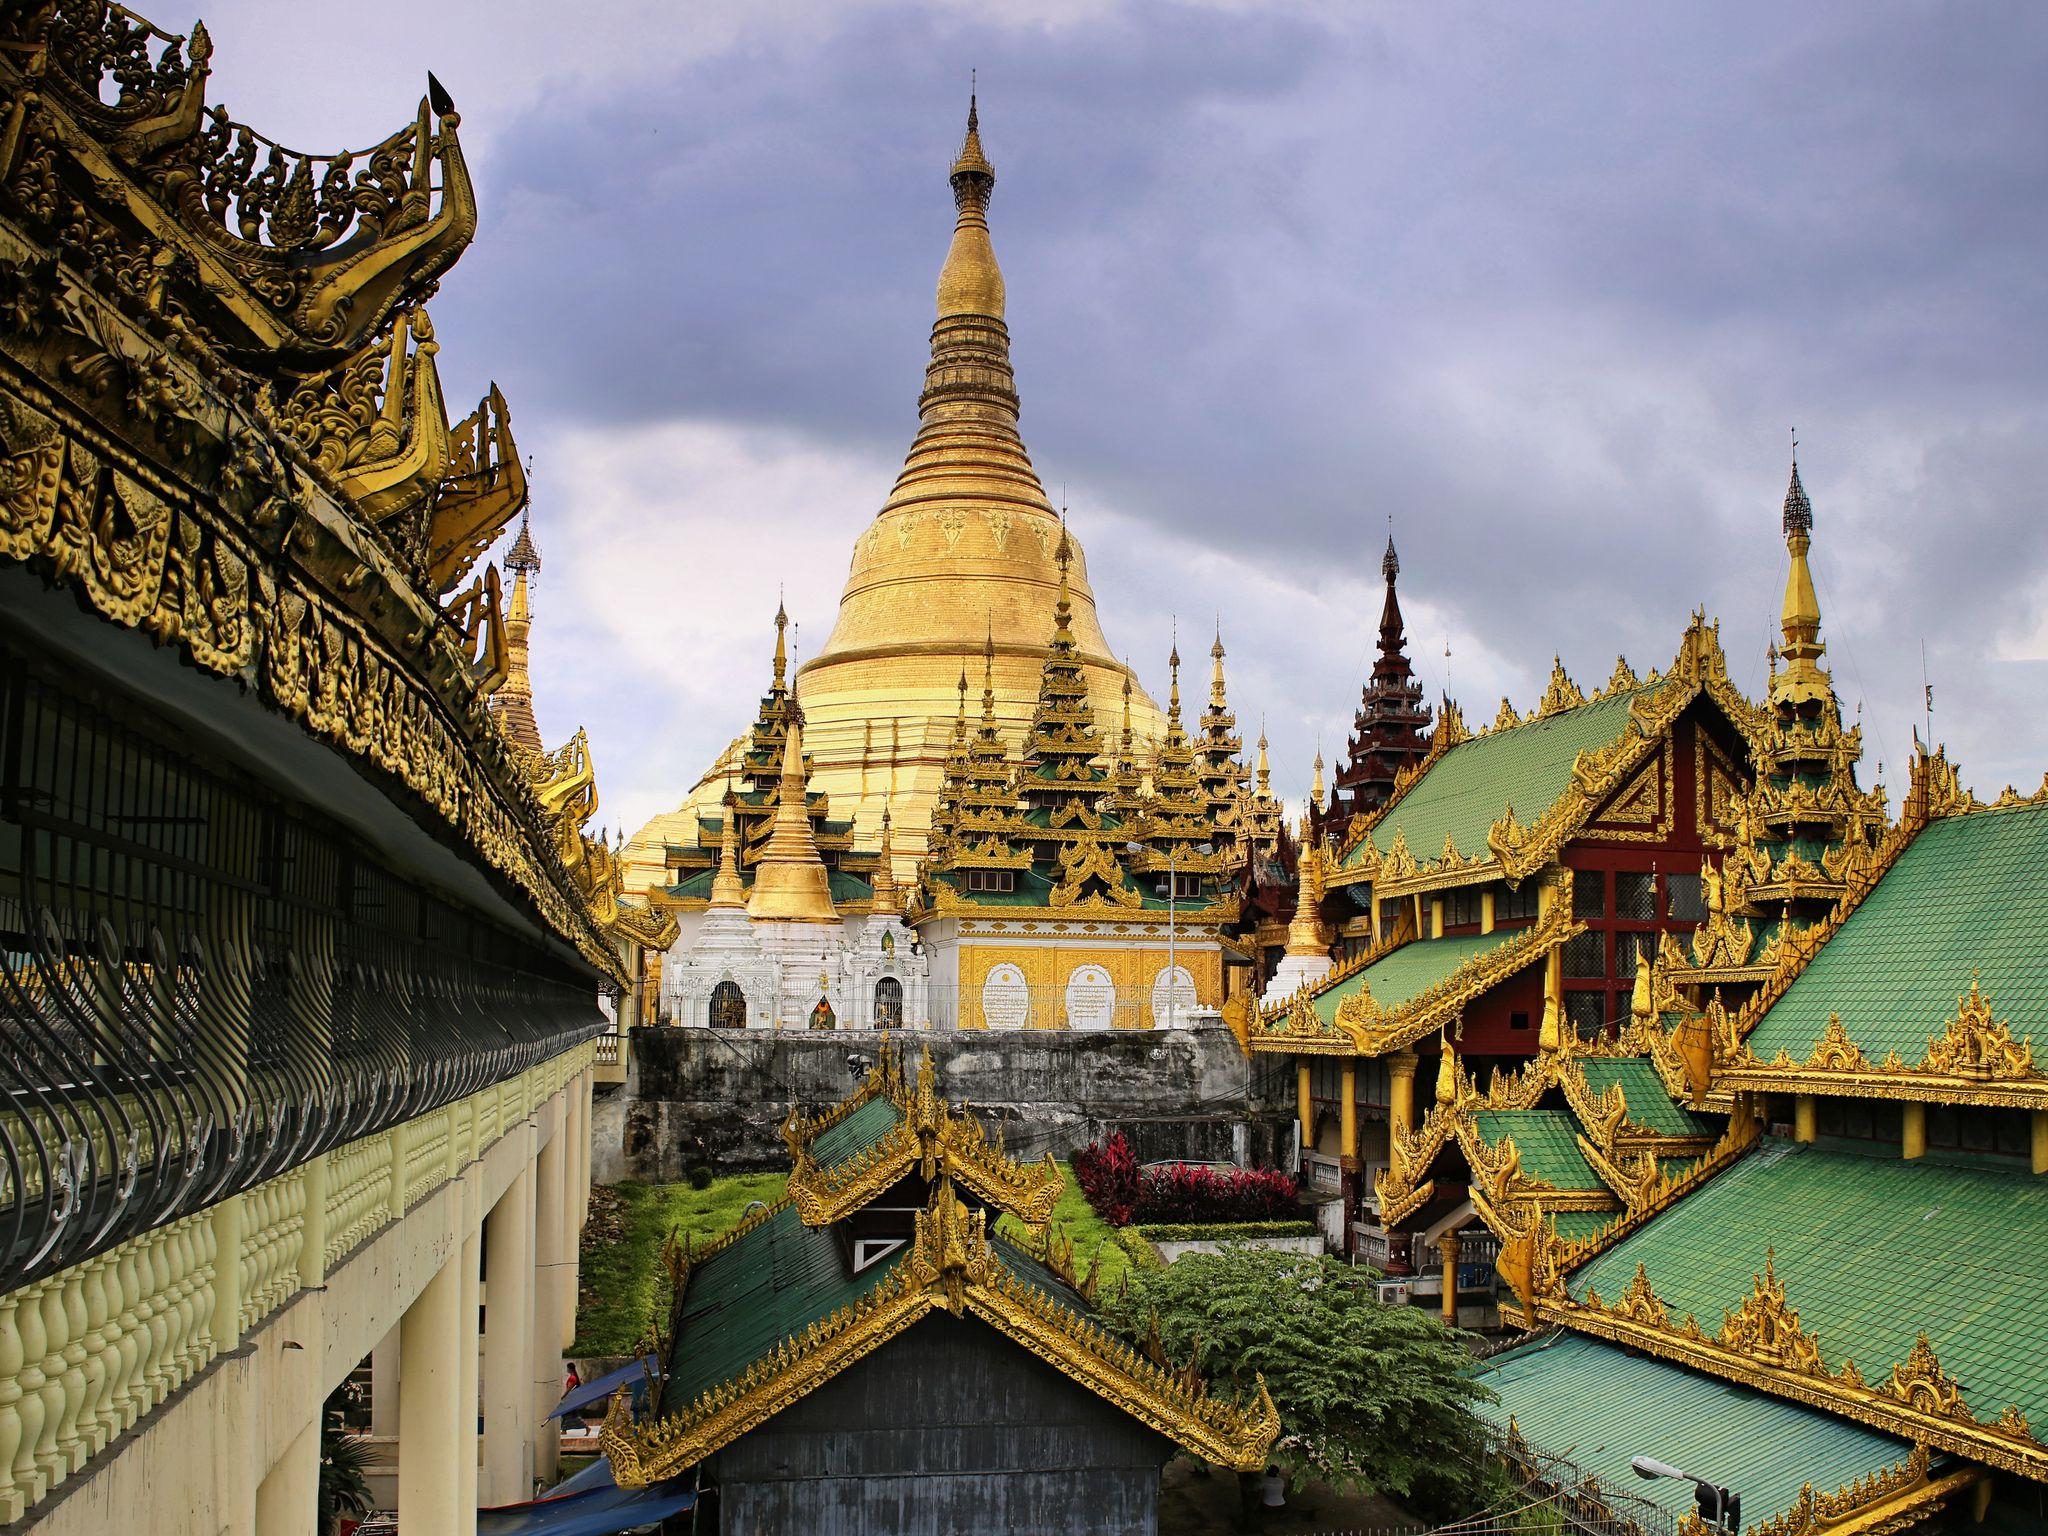 Yangon City Tour (4 Days / 3 Nights)